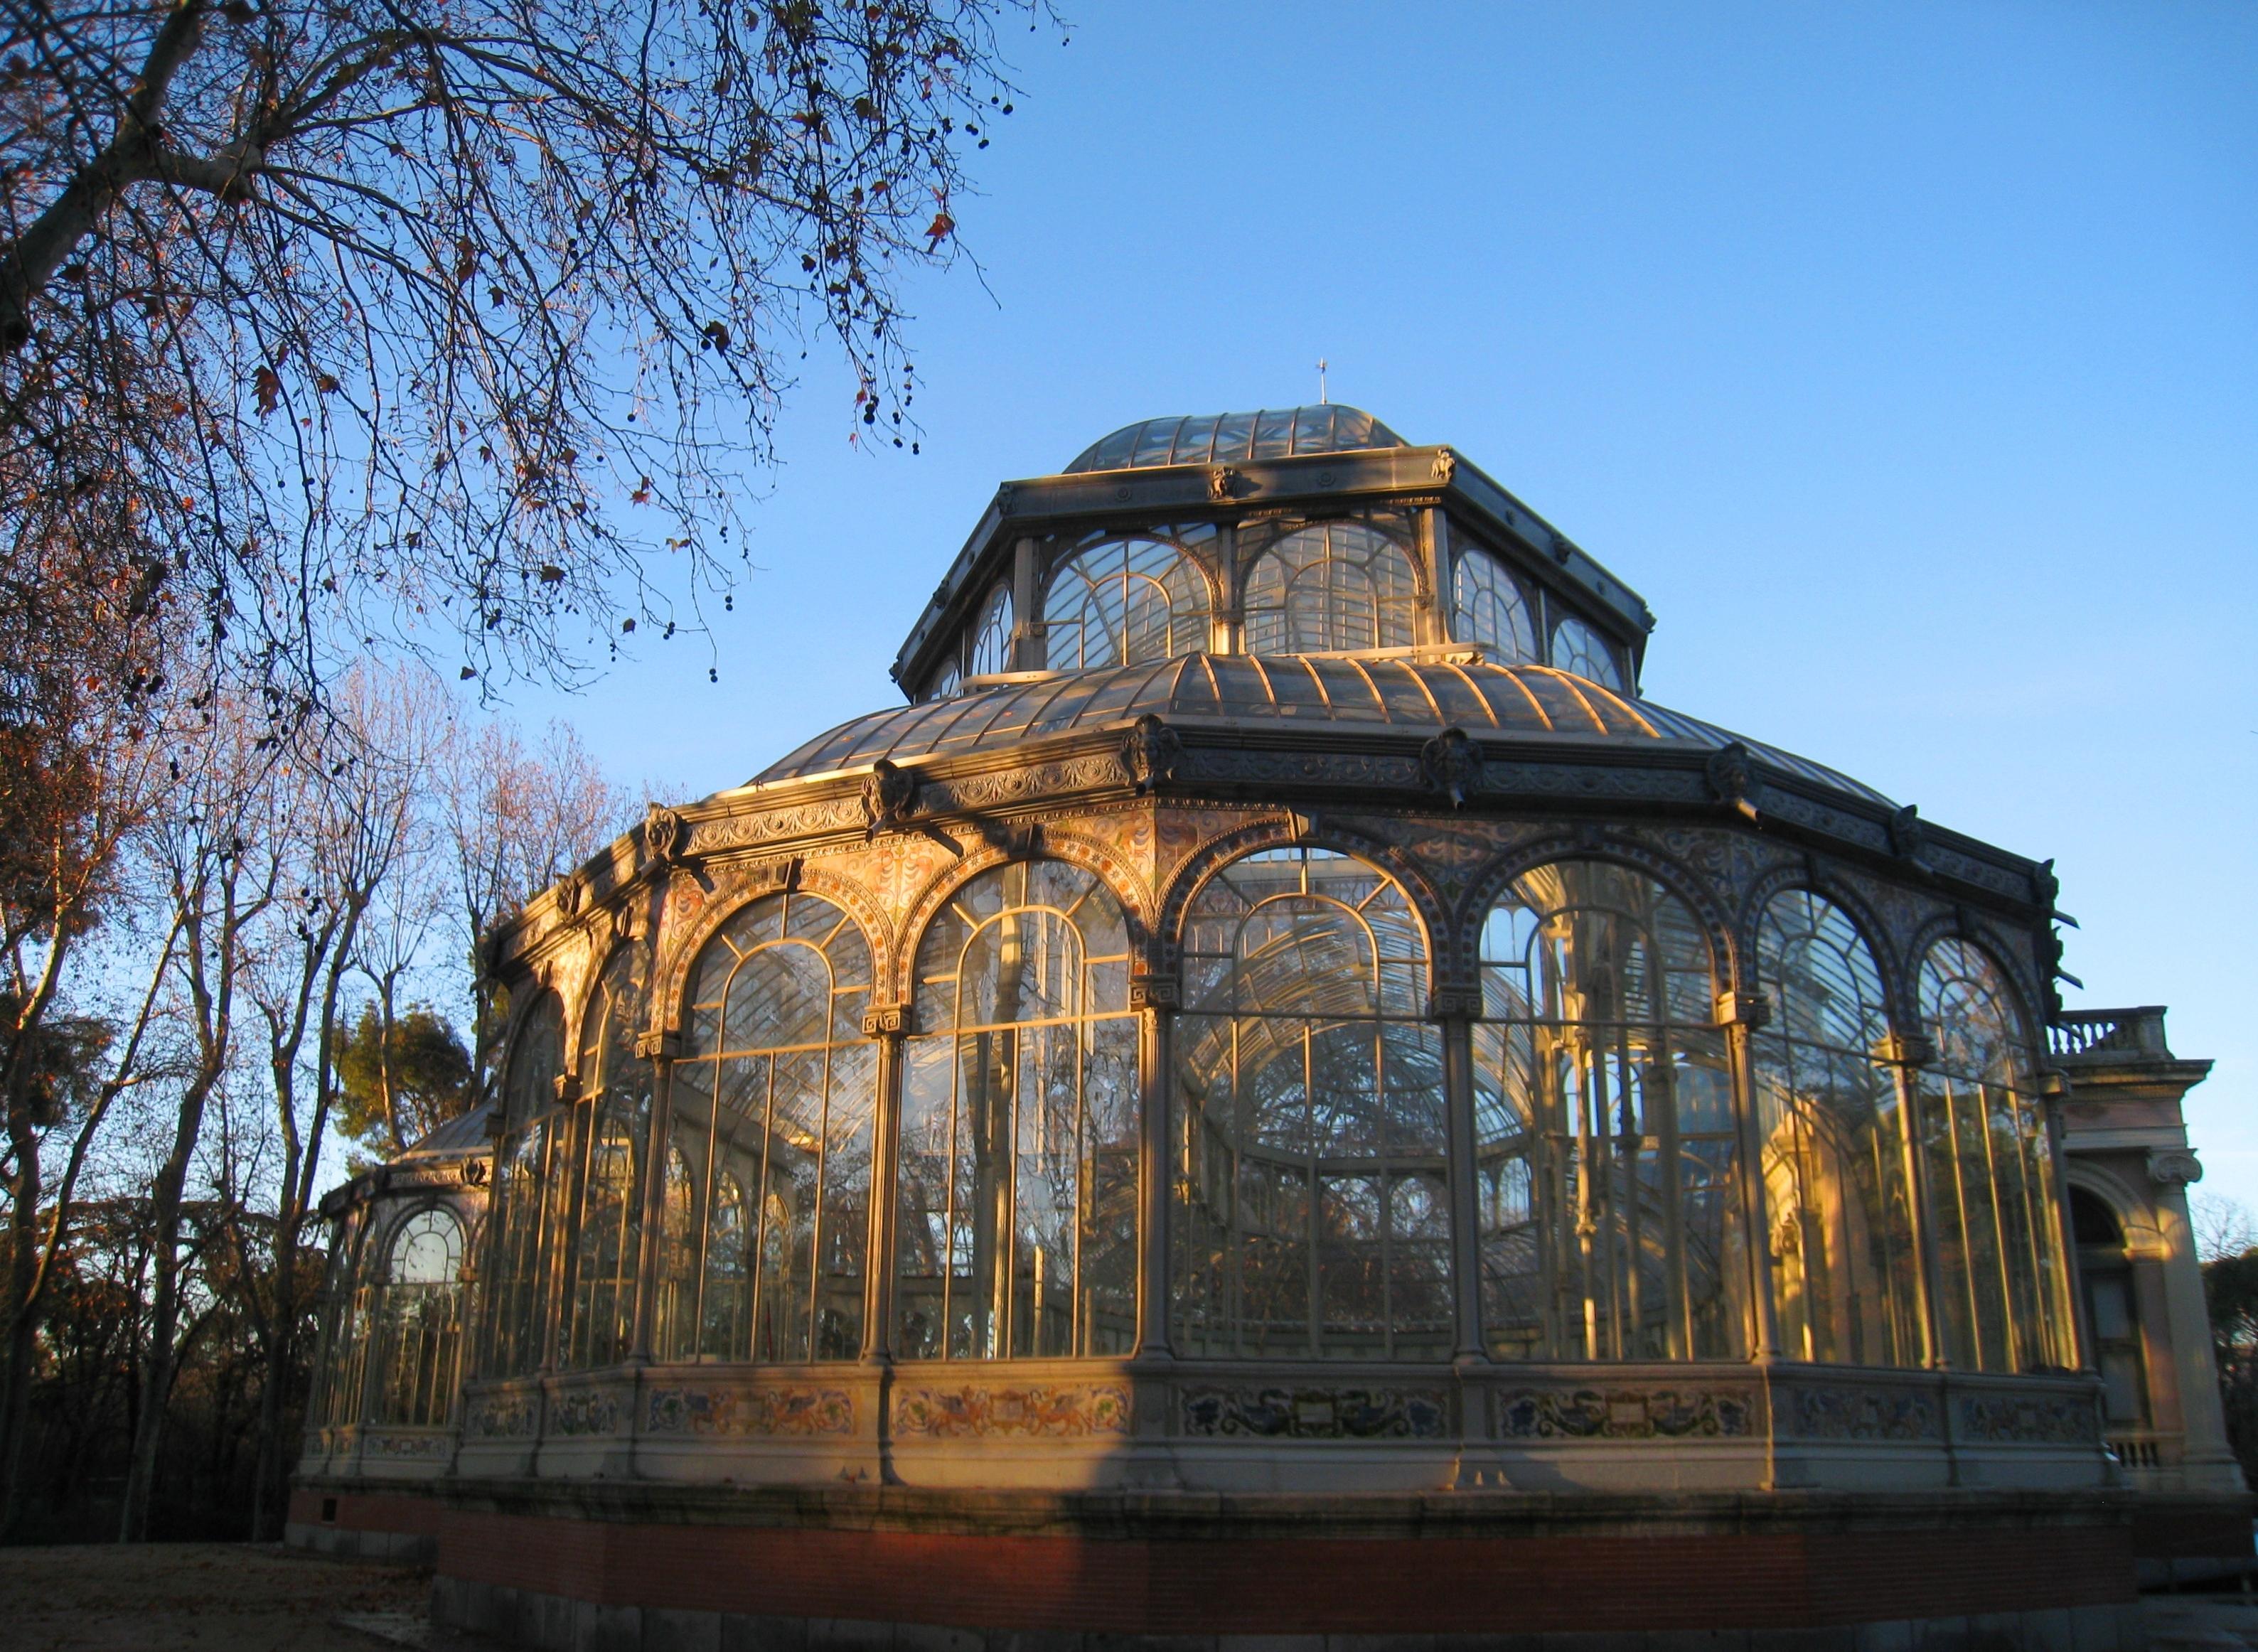 File Palacio De Cristal Parque Del Buen Retiro Madrid Exterior Jpg Wikimedia Commons